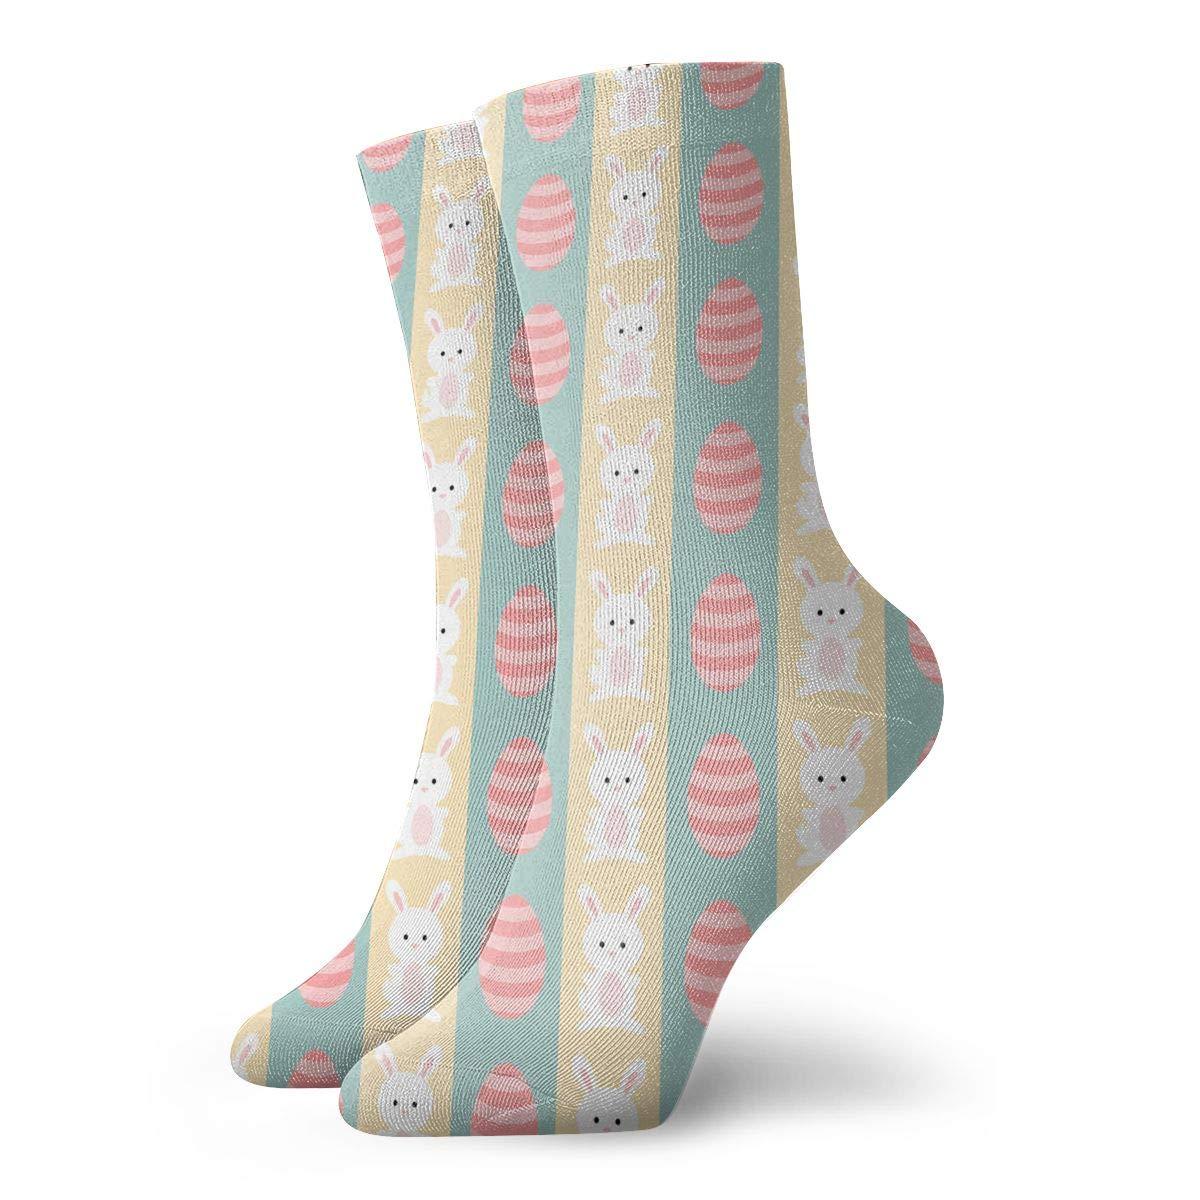 Easter Unisex Funny Casual Crew Socks Athletic Socks For Boys Girls Kids Teenagers